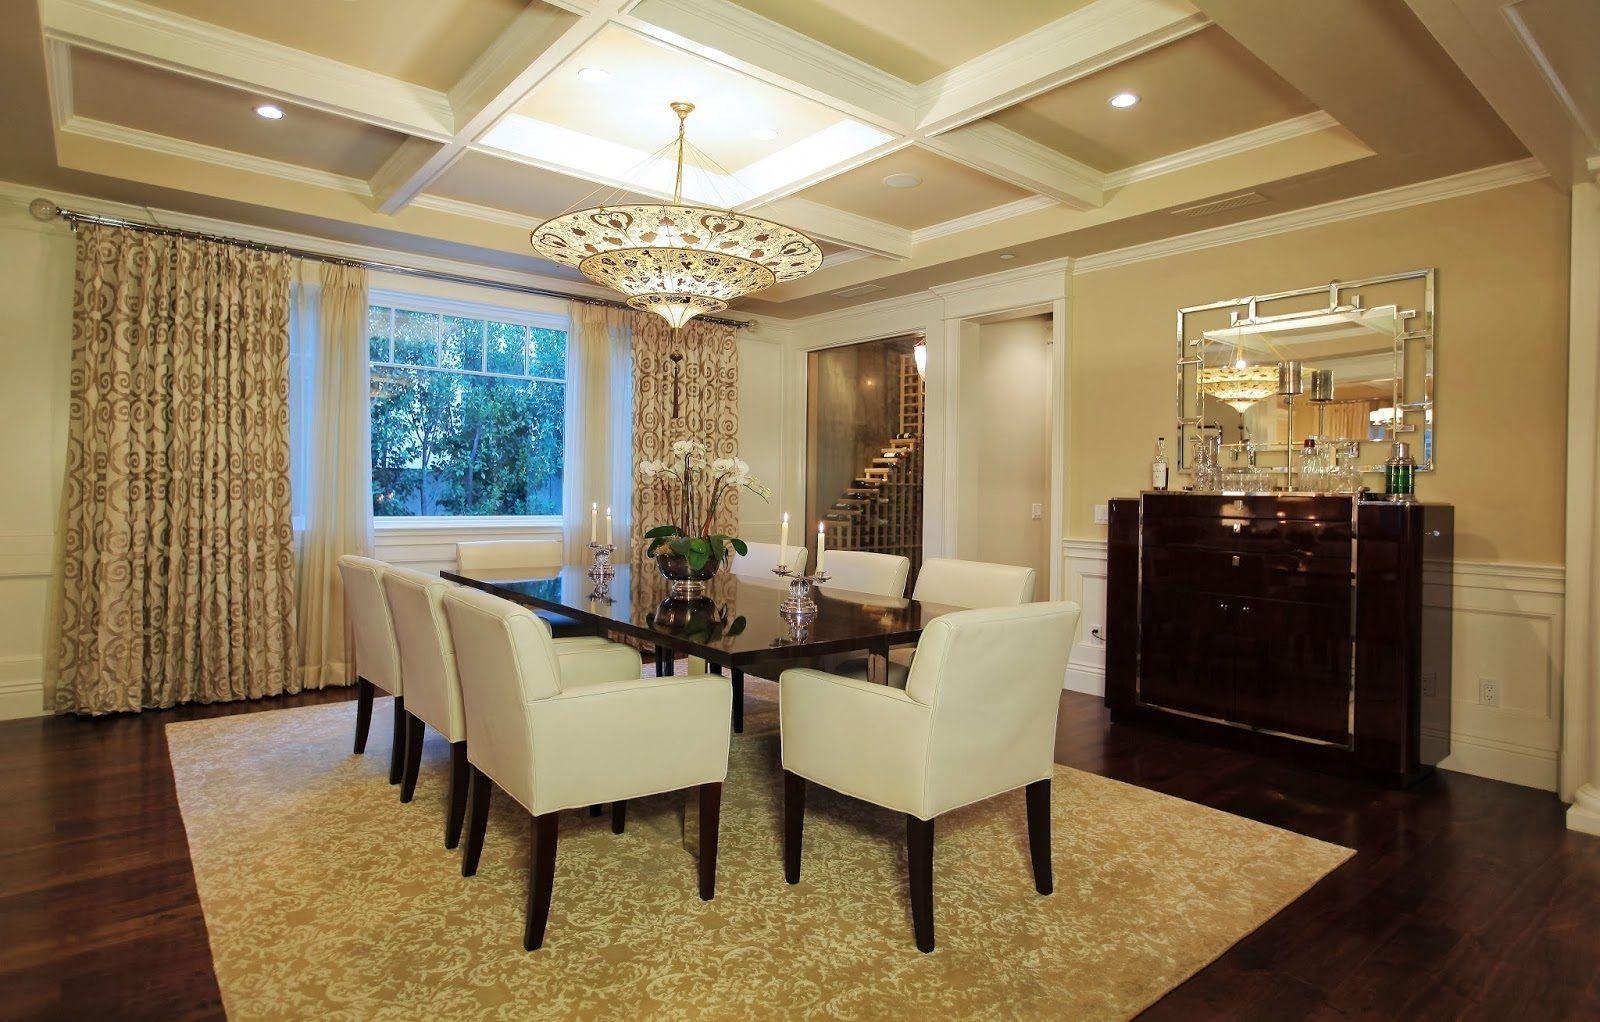 10+ Stunning Pop Ceiling Living Room Design